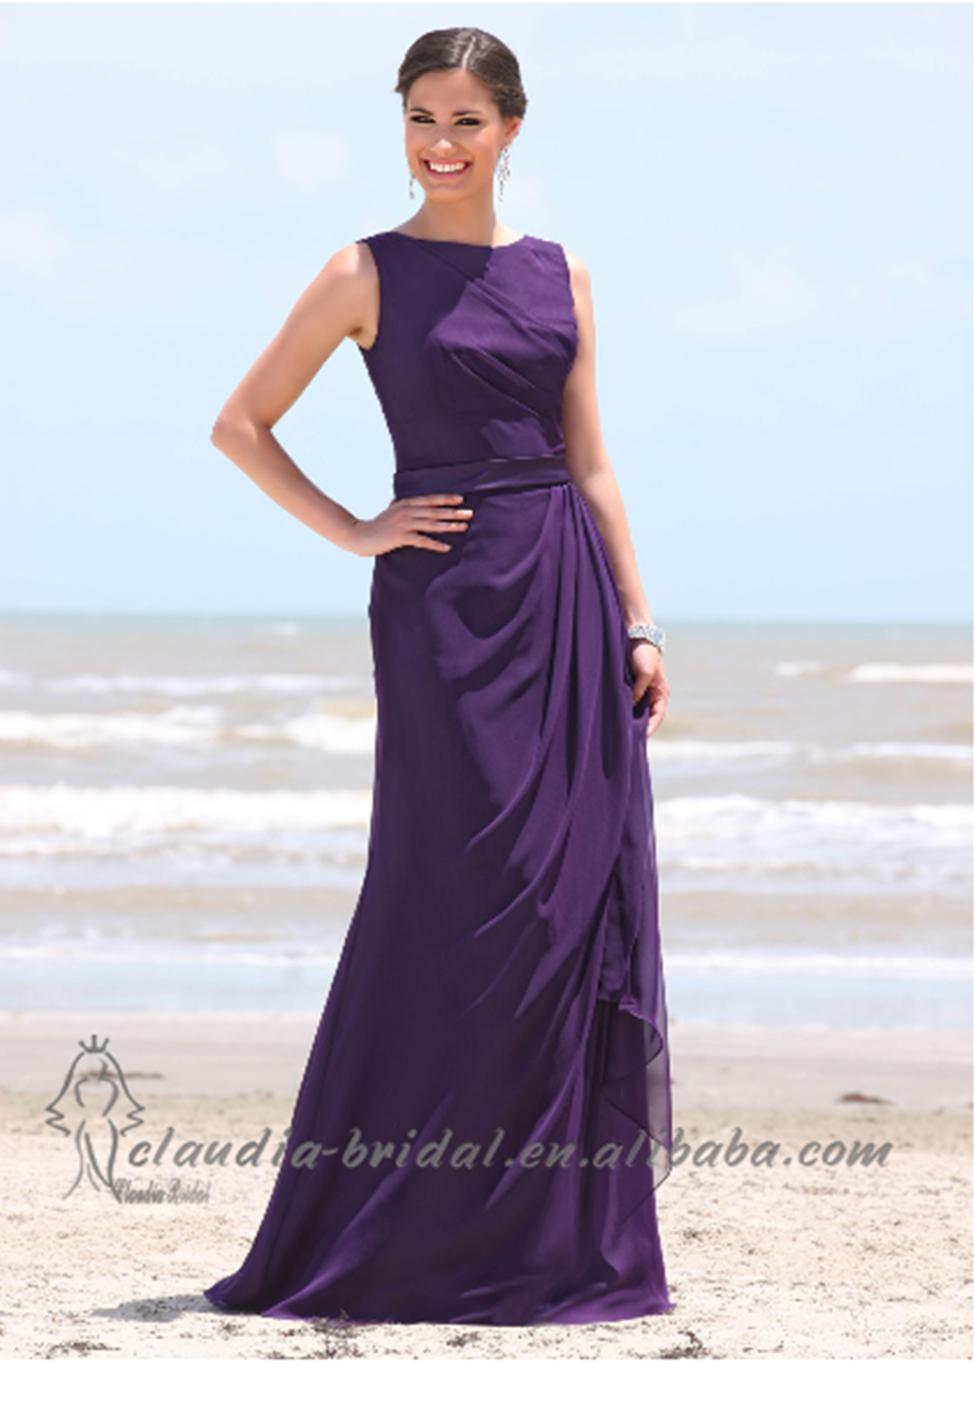 Deep Purple Wedding Dresses : Deep purple bridesmaid dress wedding